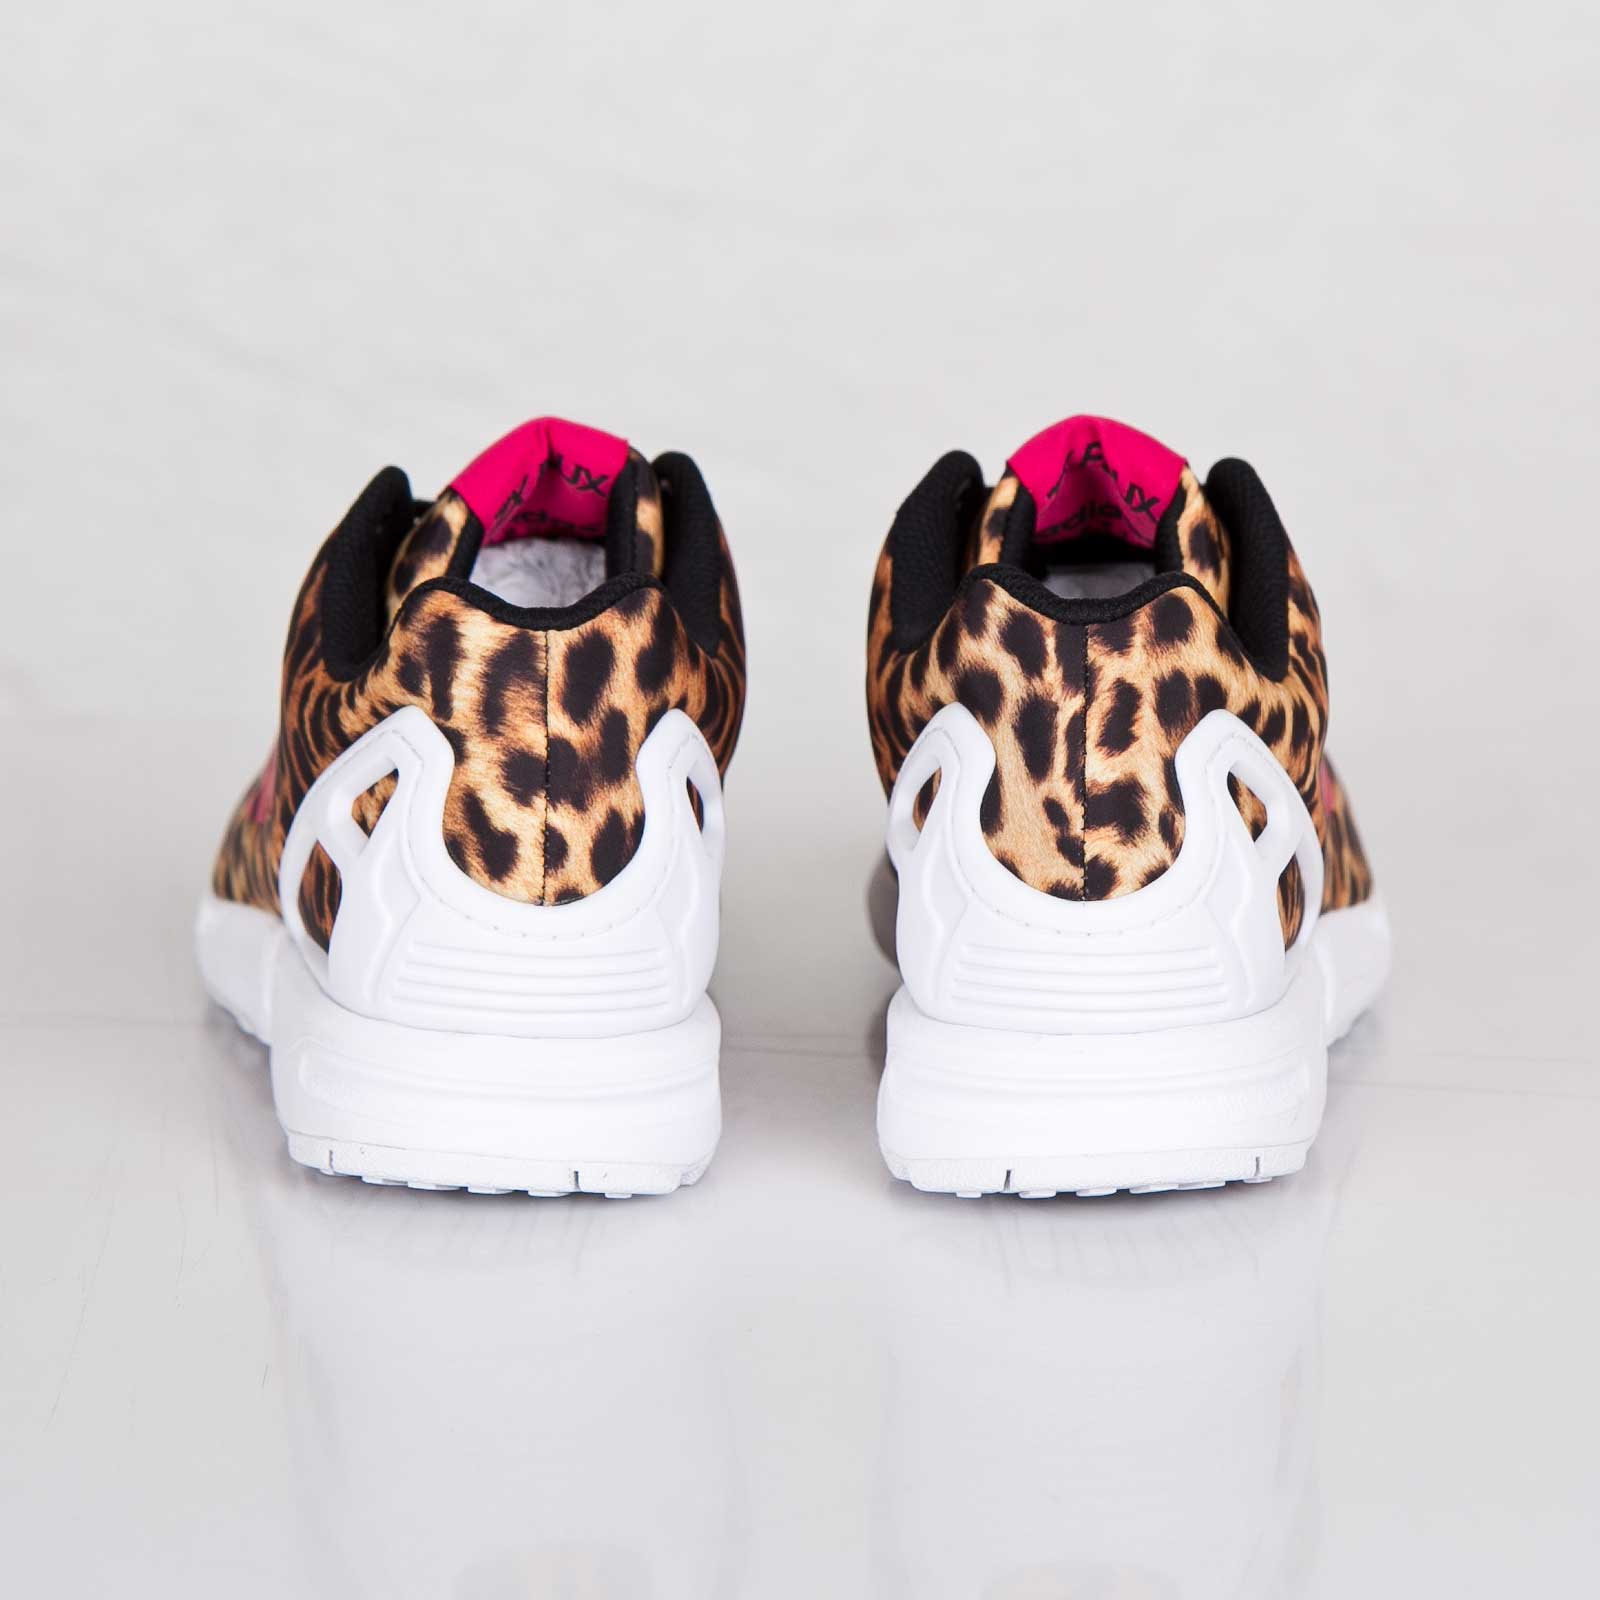 adidas ZX Flux M21365 Sneakersnstuff   sneakers